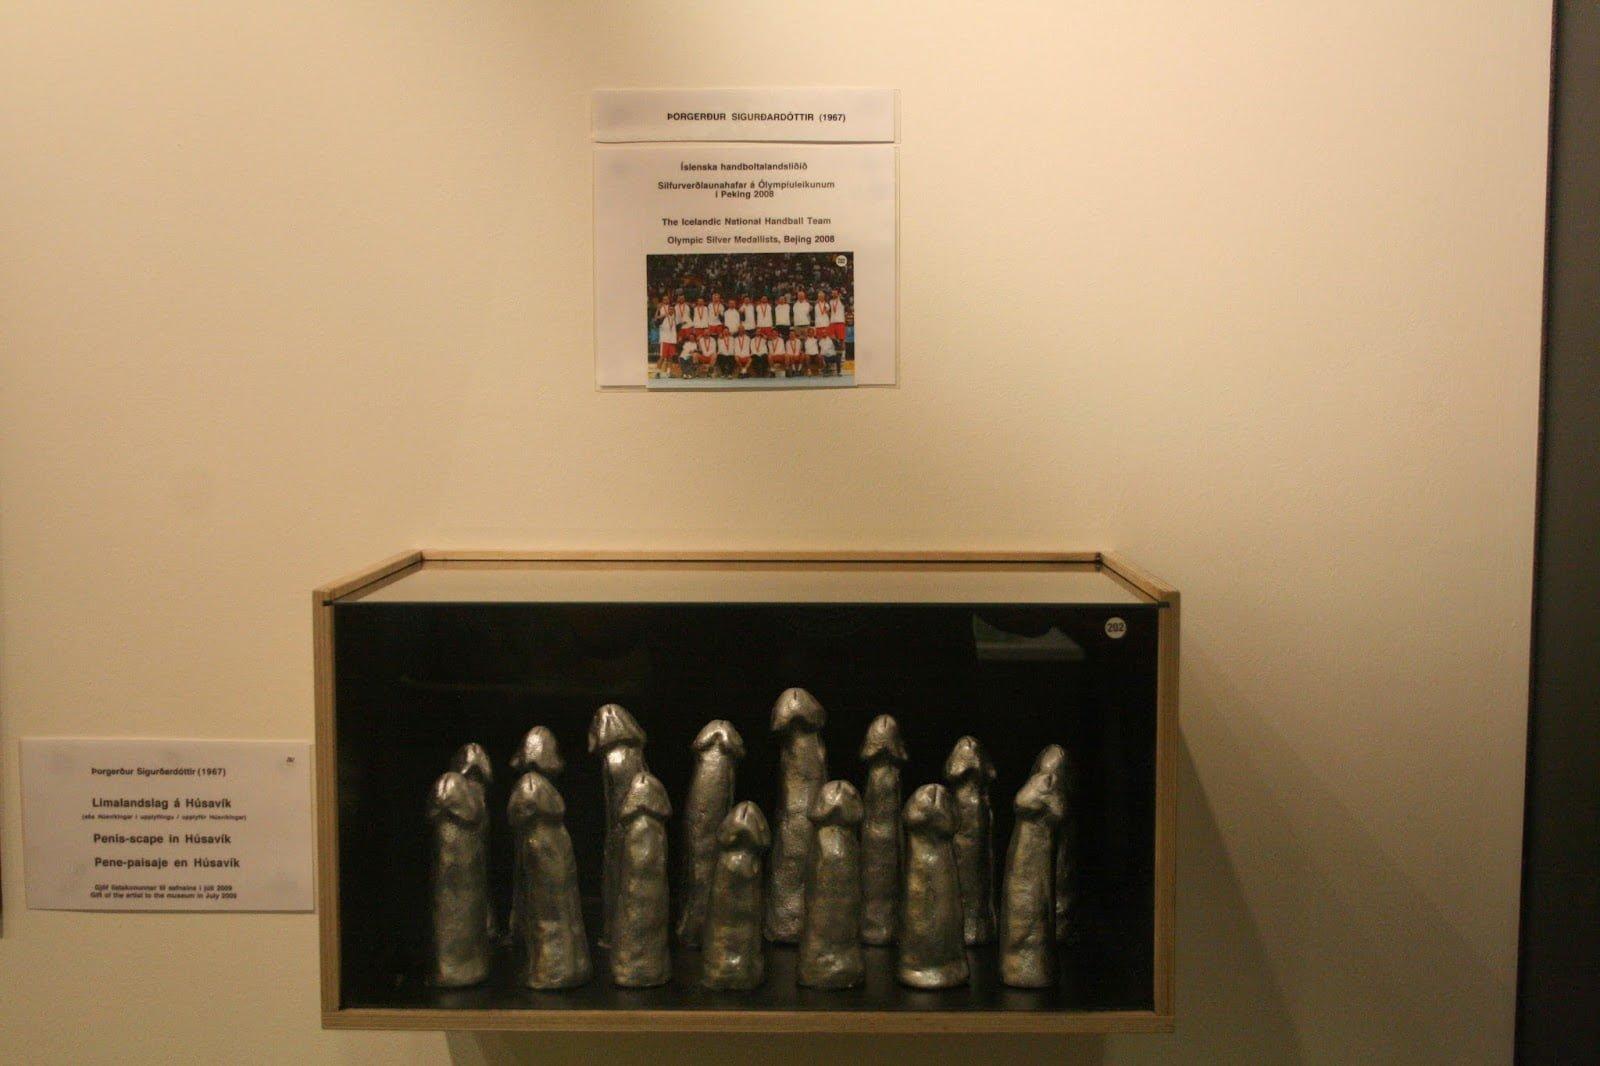 Sculptures in honor of the 2008 Silver Medal-winning Icelandic handball team